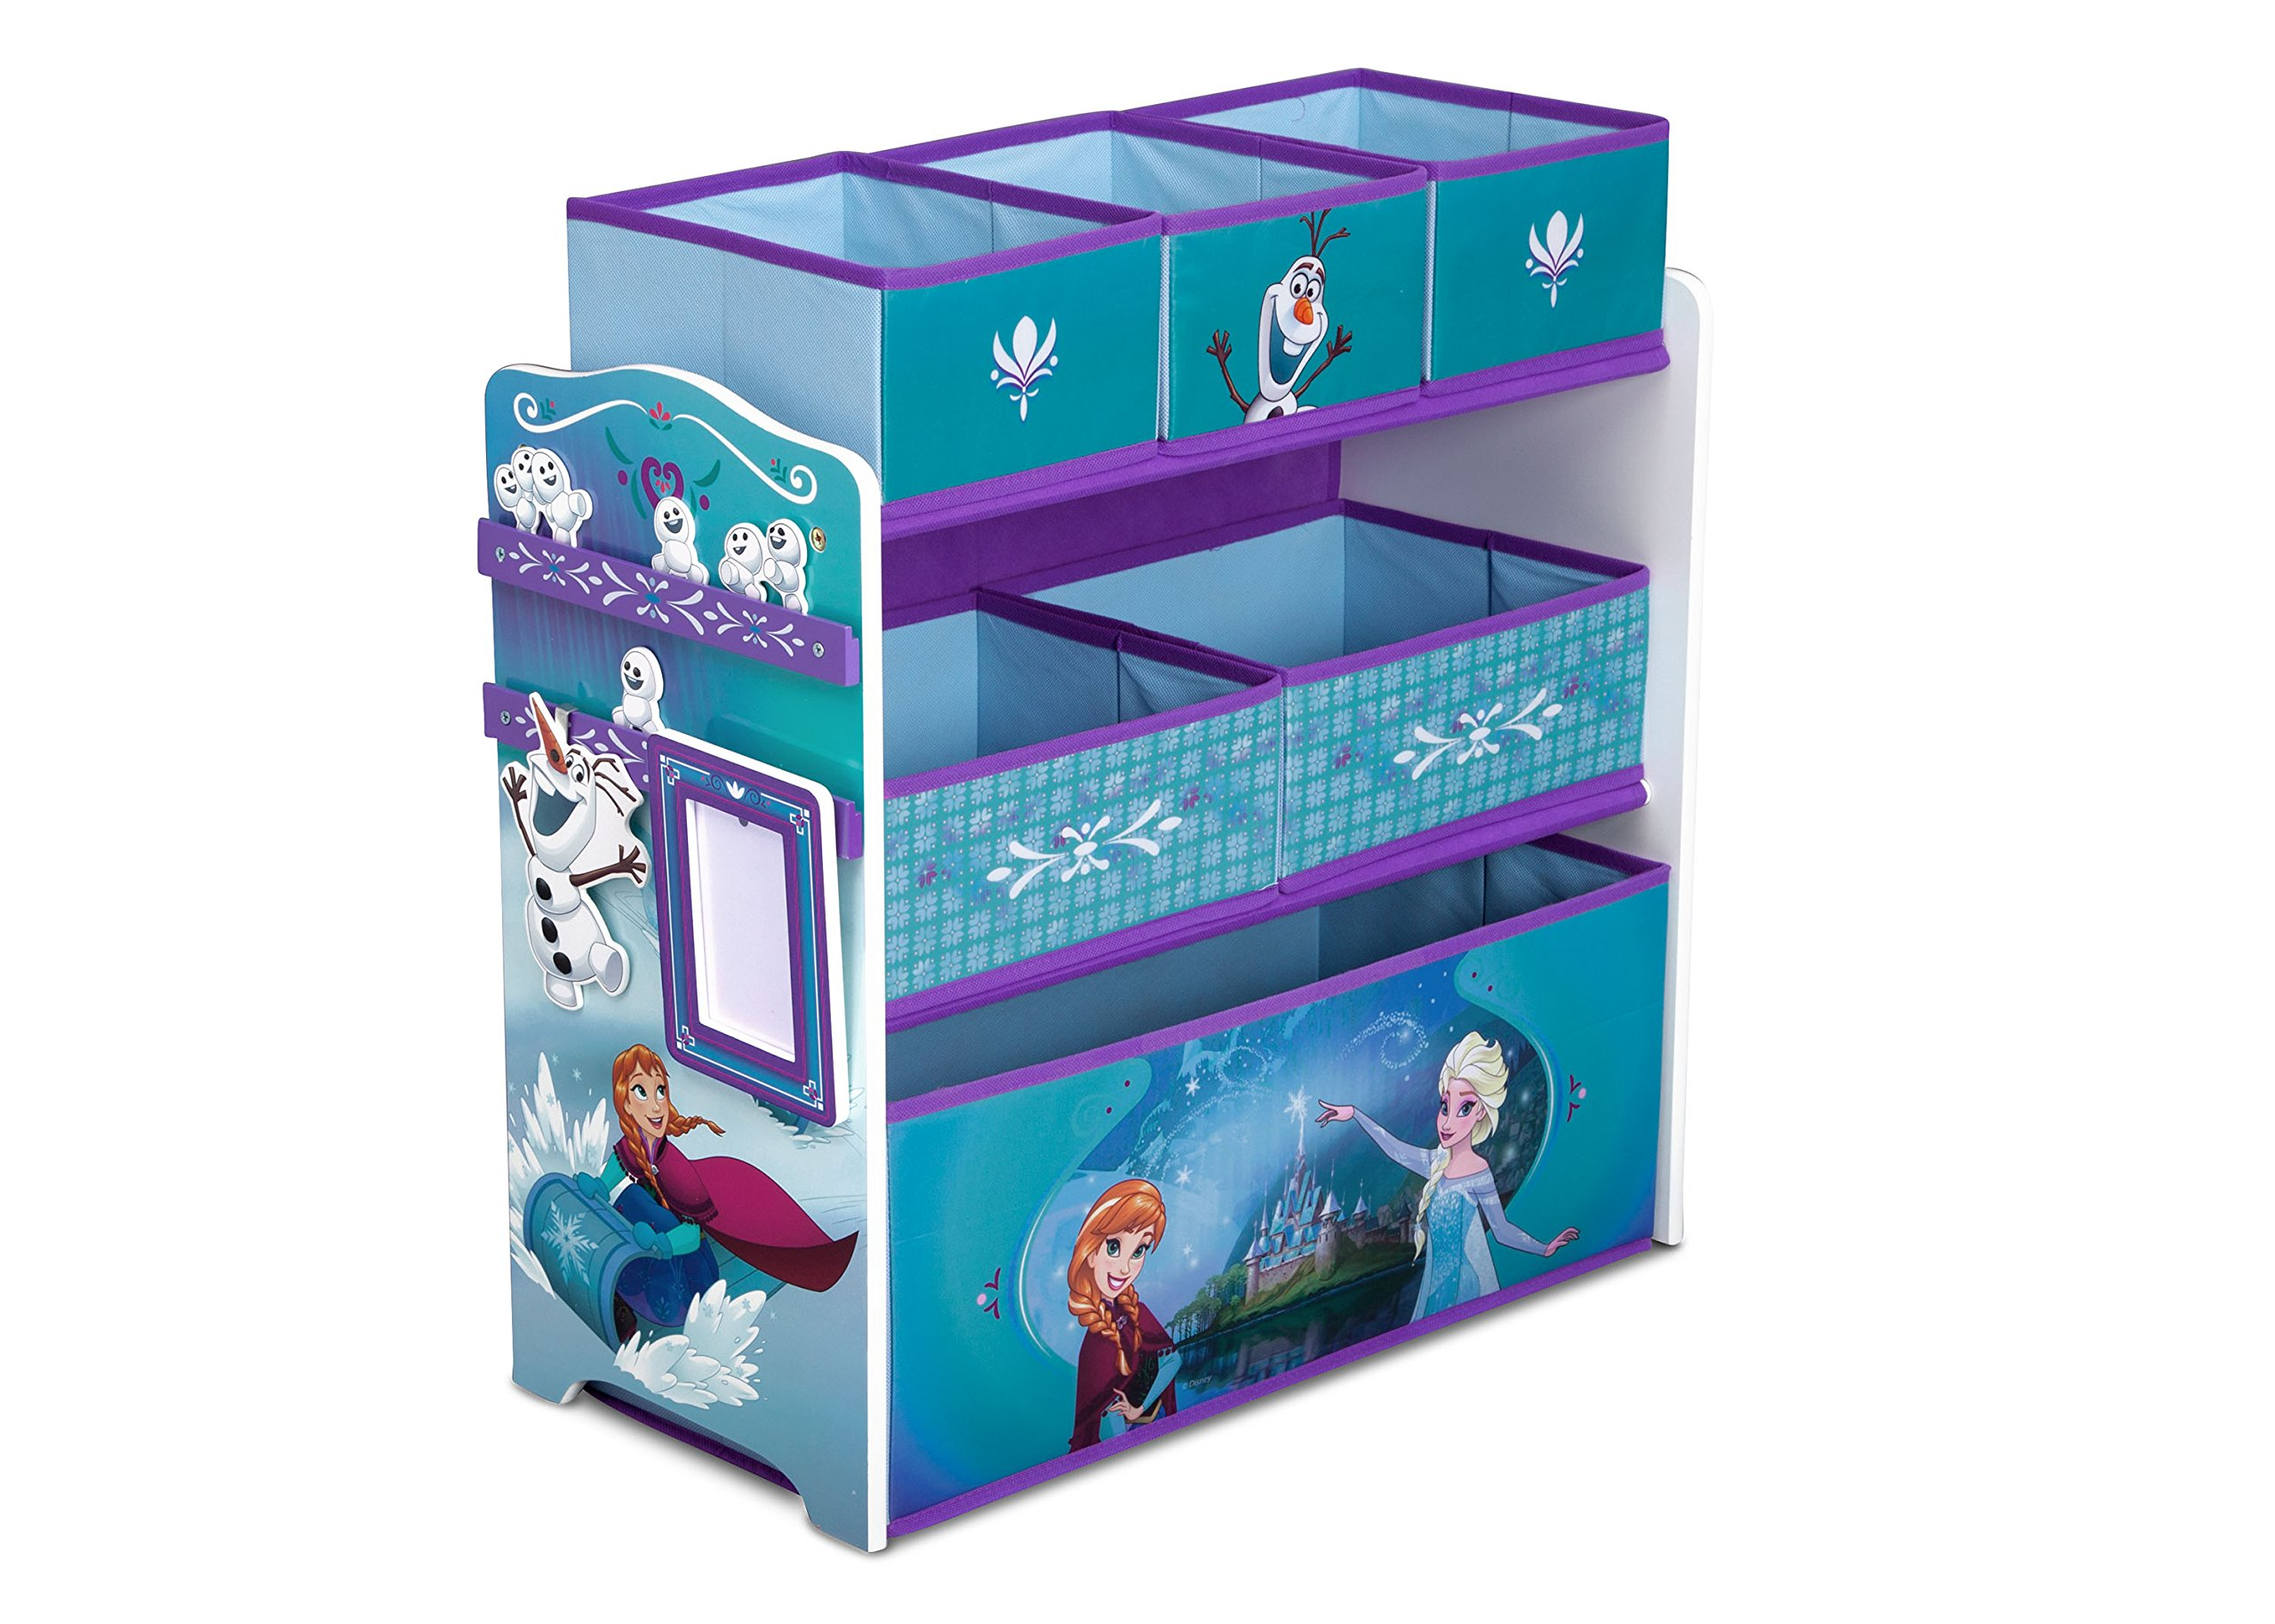 Disney Frozen Multi-Bin Toy Organizer with Dry Erase Board, Photo Frame, Elsa, Anna, Snowgies and Olaf